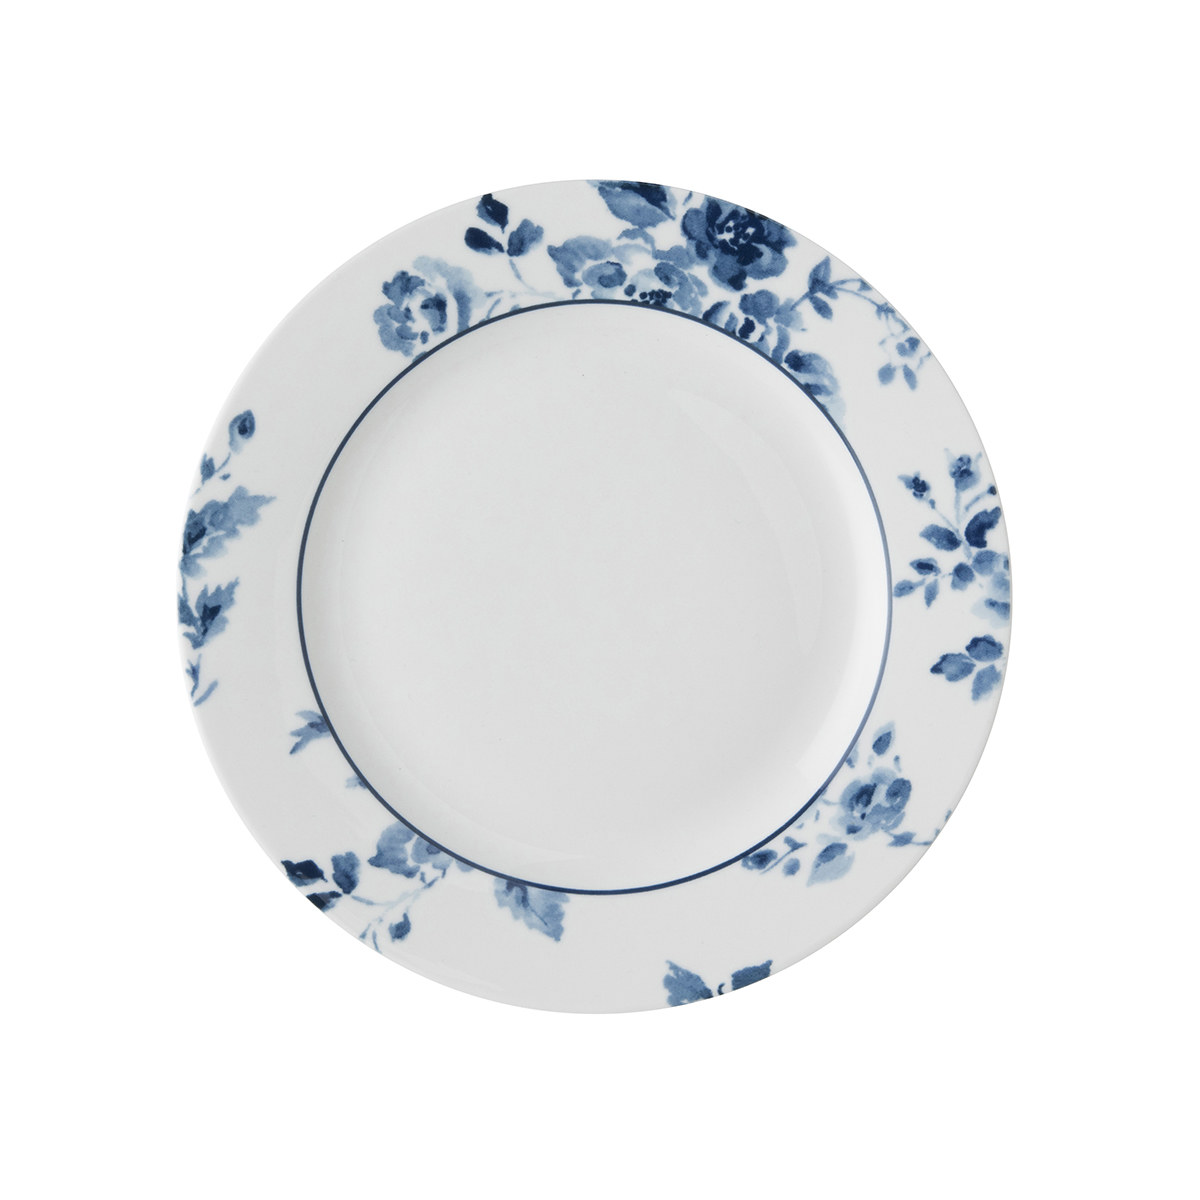 CHINA ROSE PLATE 18cm